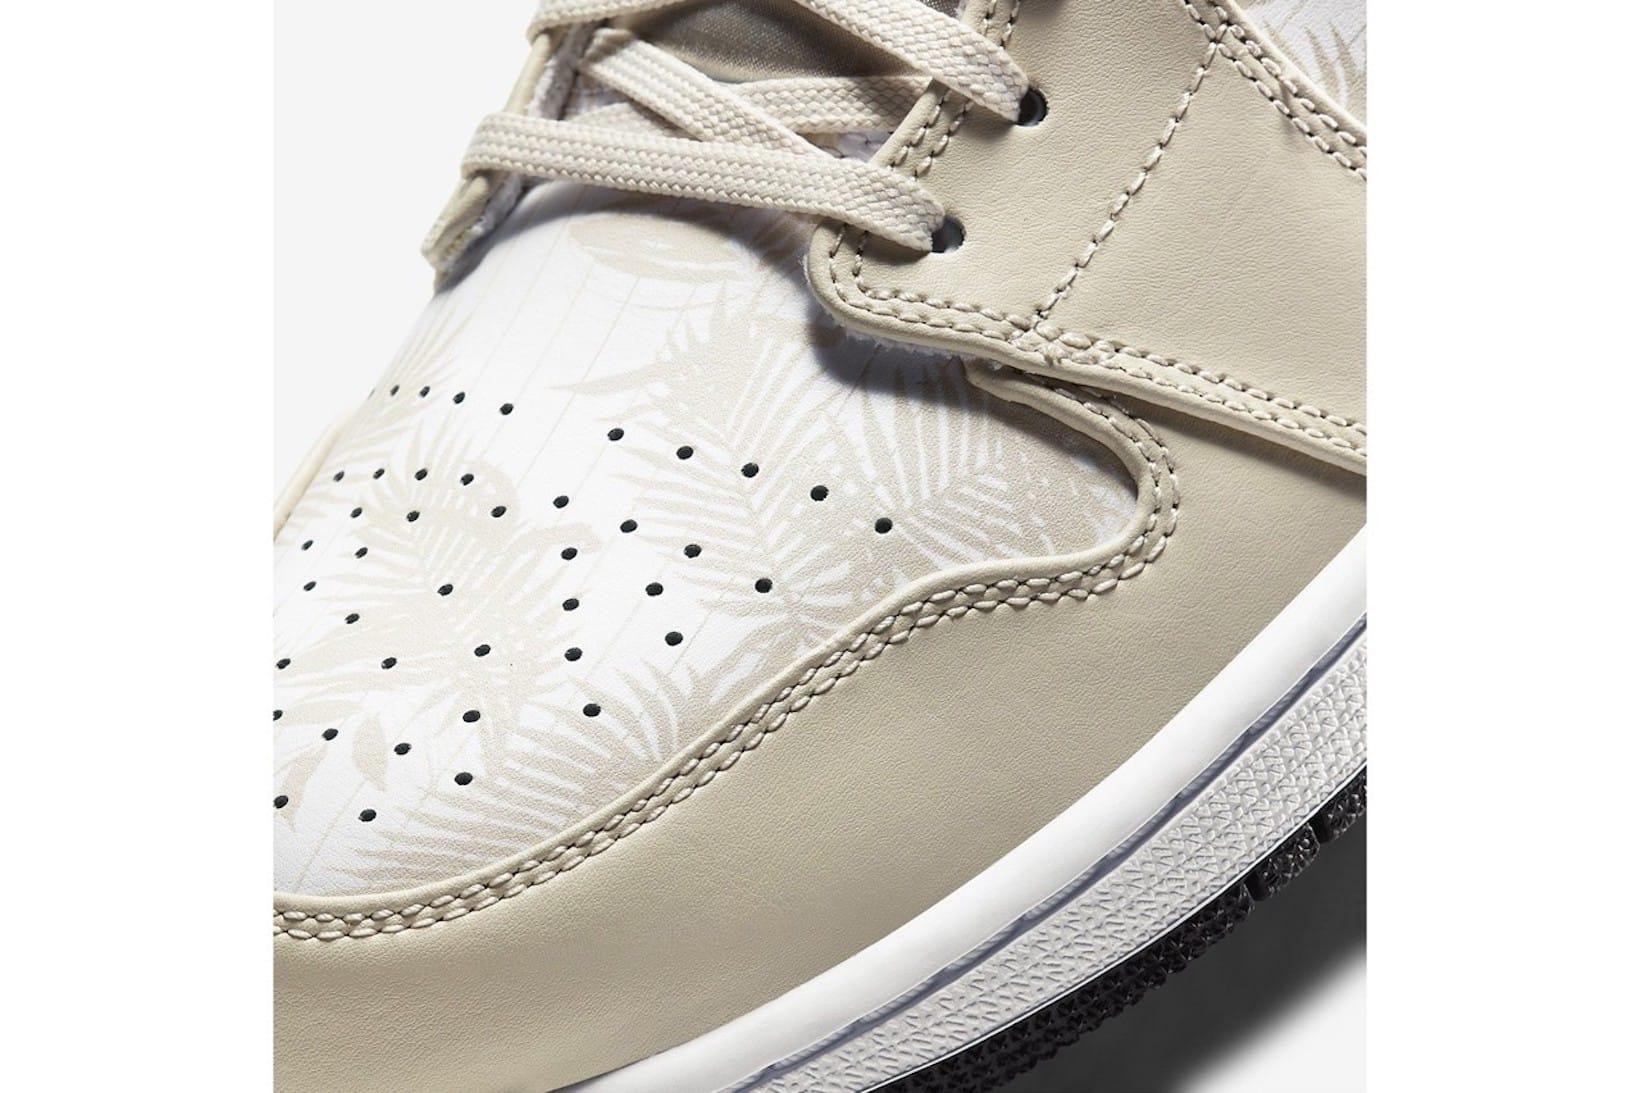 Air Jordan 1 Low Yellow/Beige Release